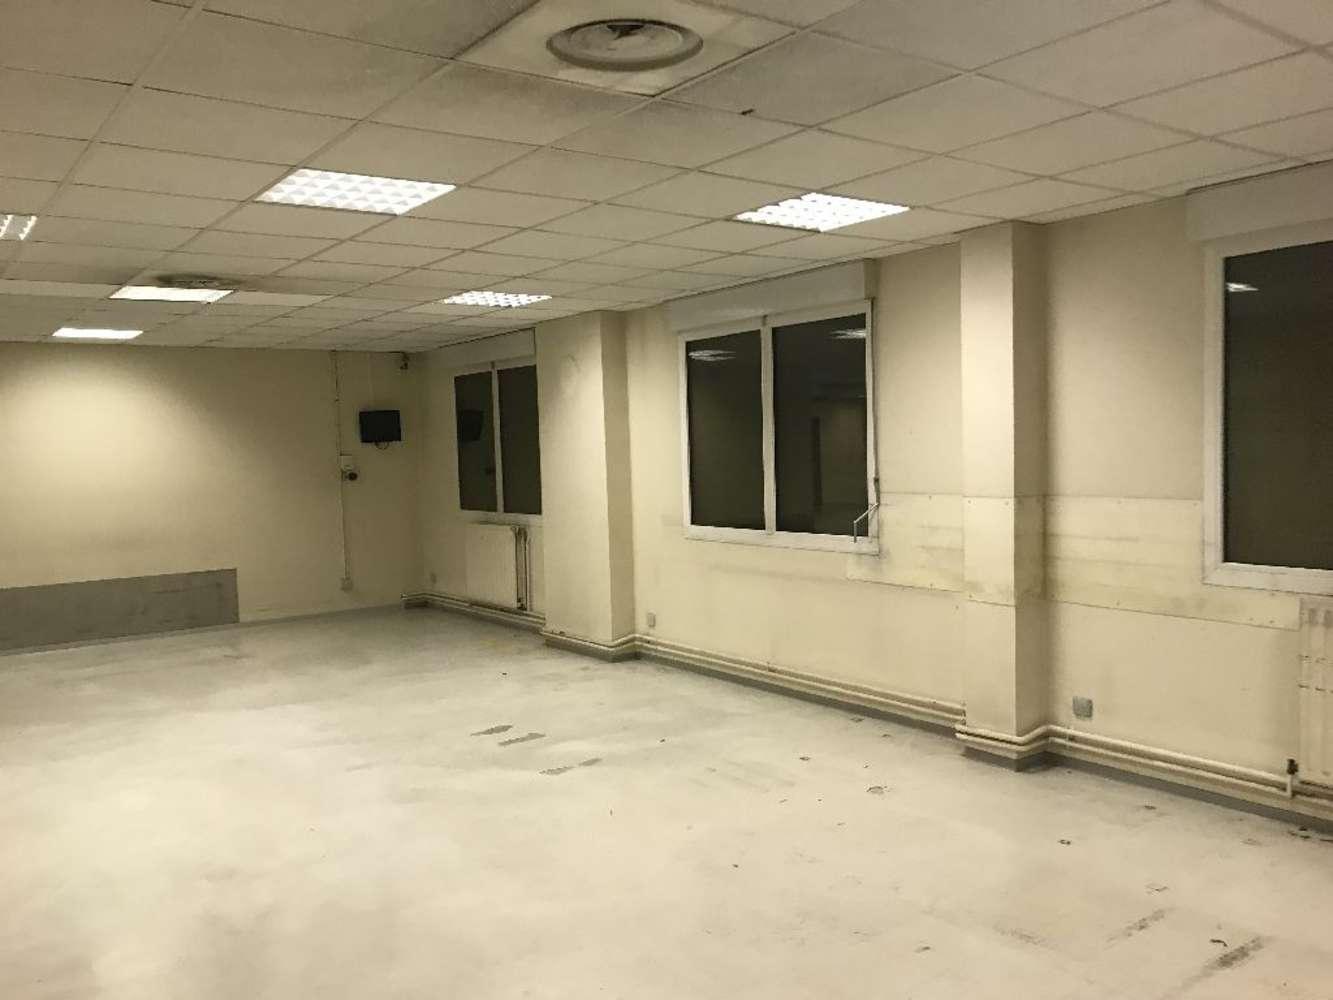 Activités/entrepôt Meyzieu, 69330 - Entrepot à vendre Meyzieu (Lyon Est) - 9862439